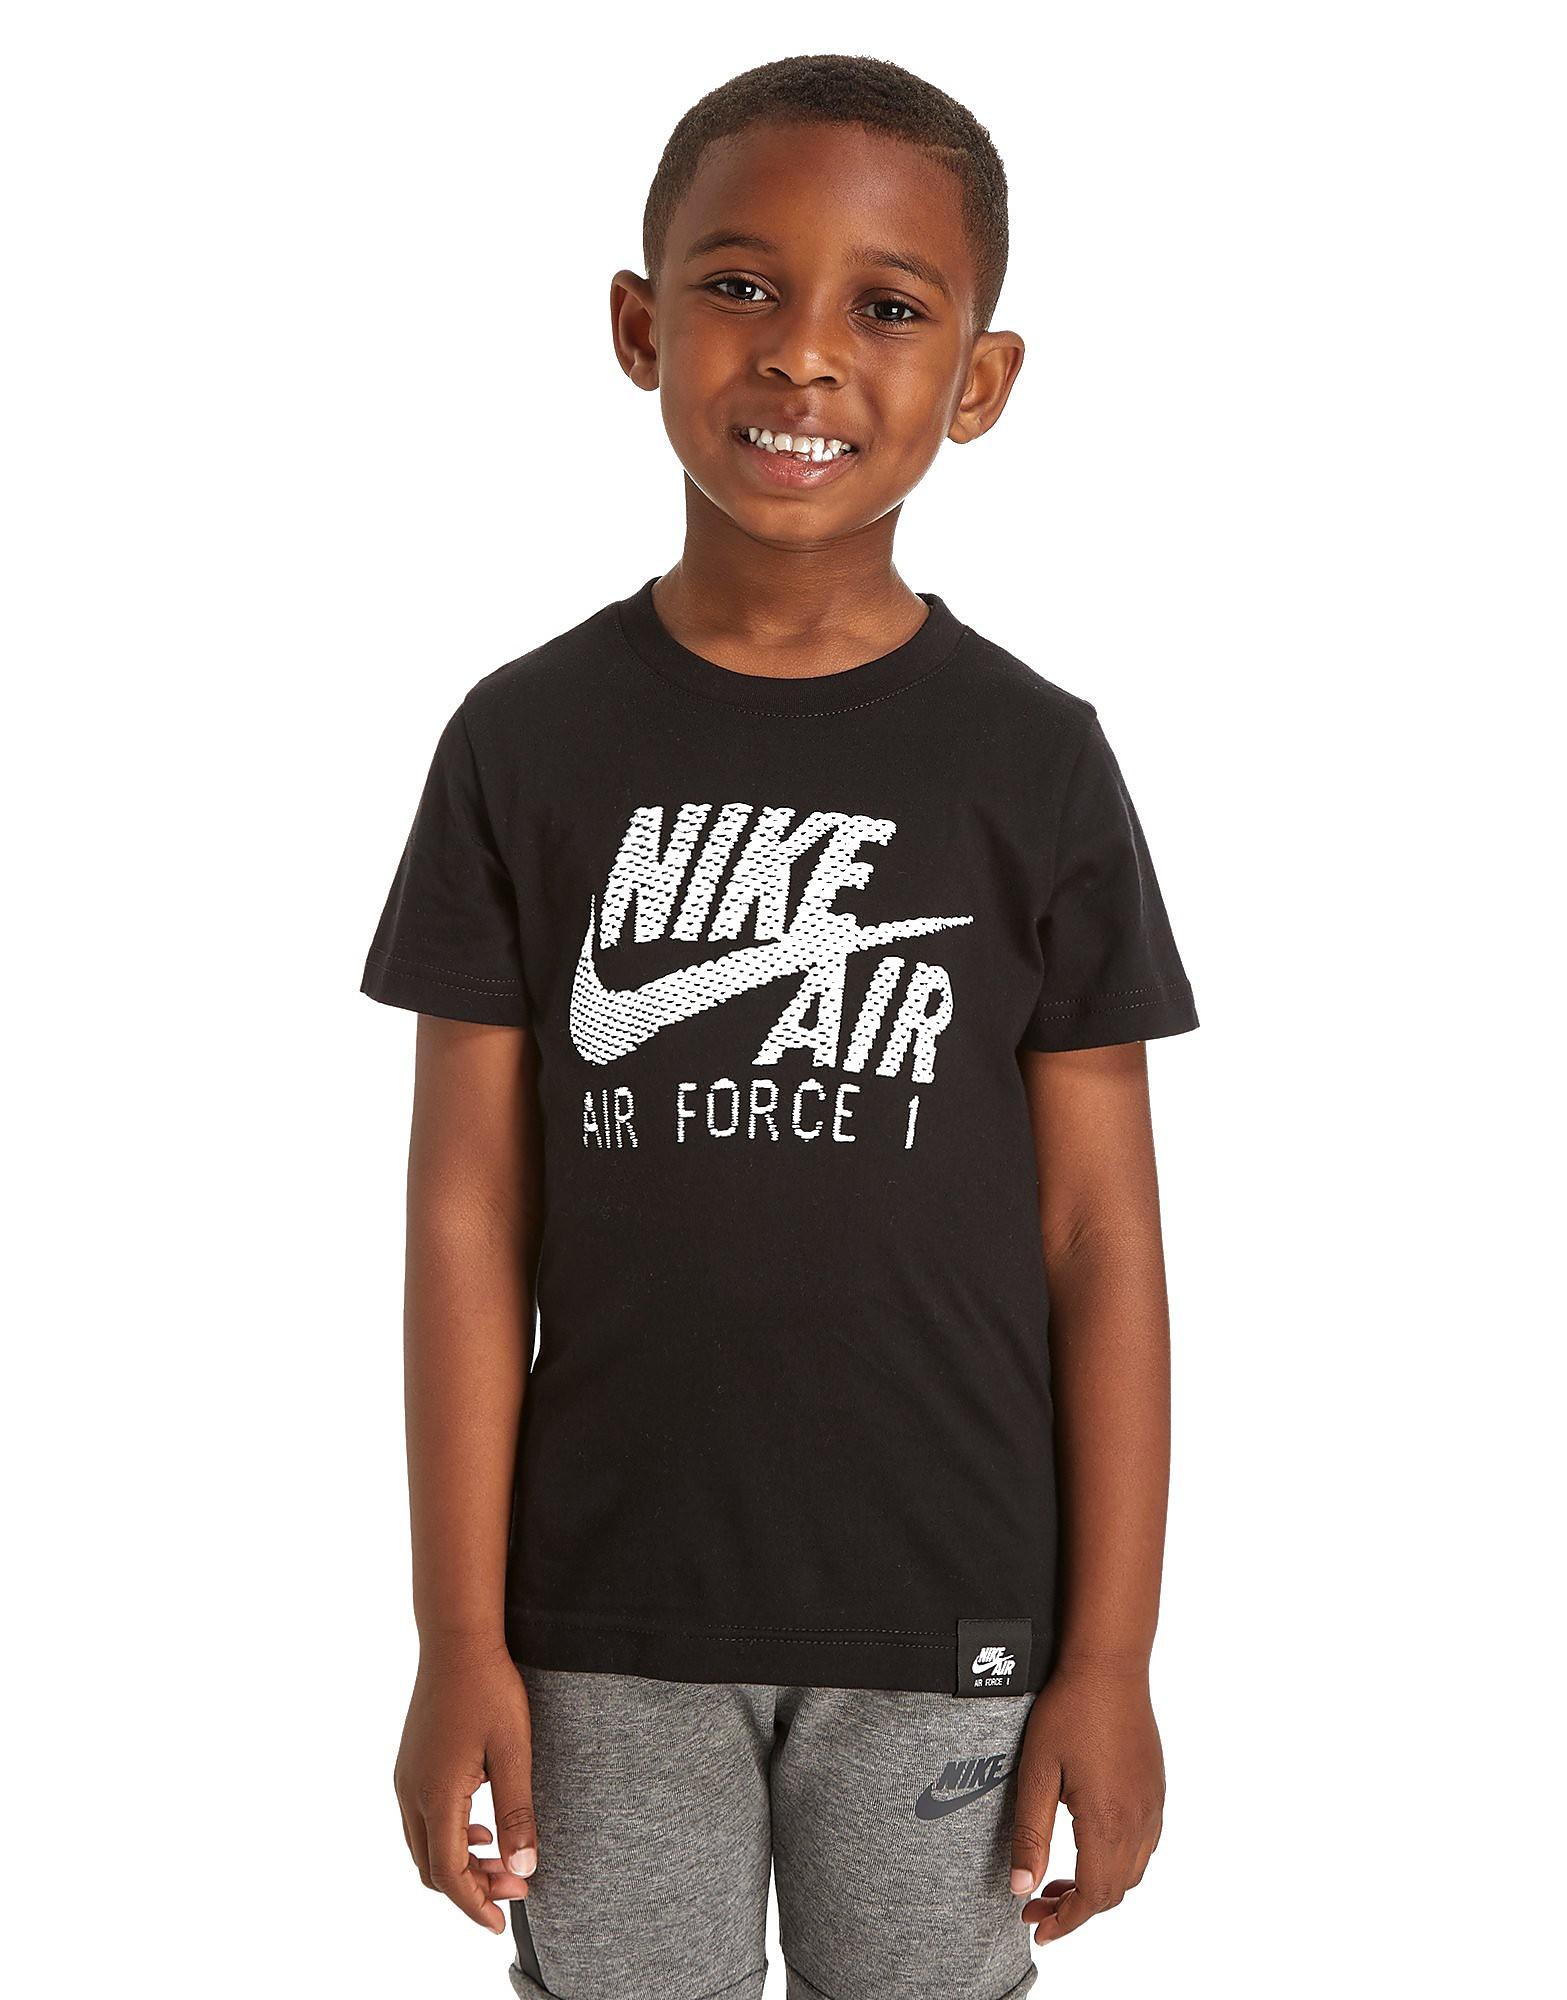 Nike Air Force 1 T-Shirt Children